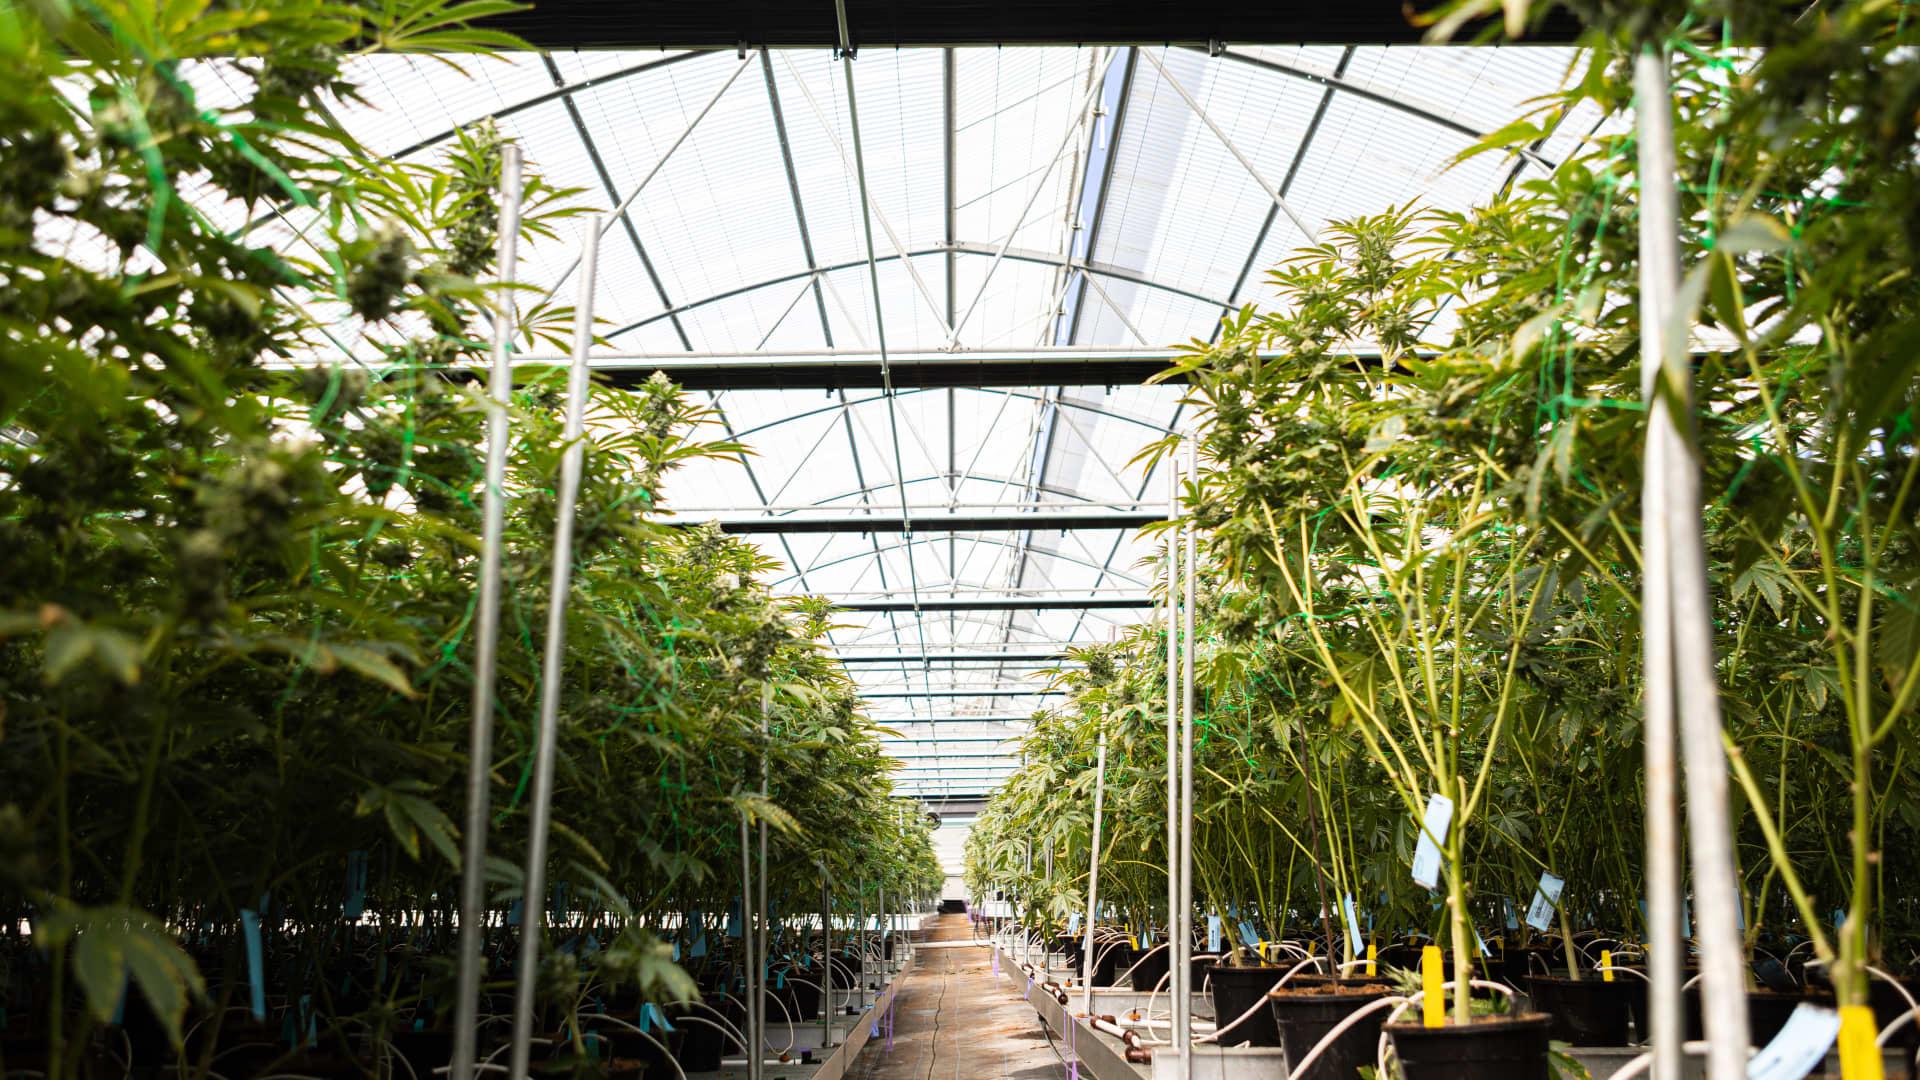 Glass House farm in California.